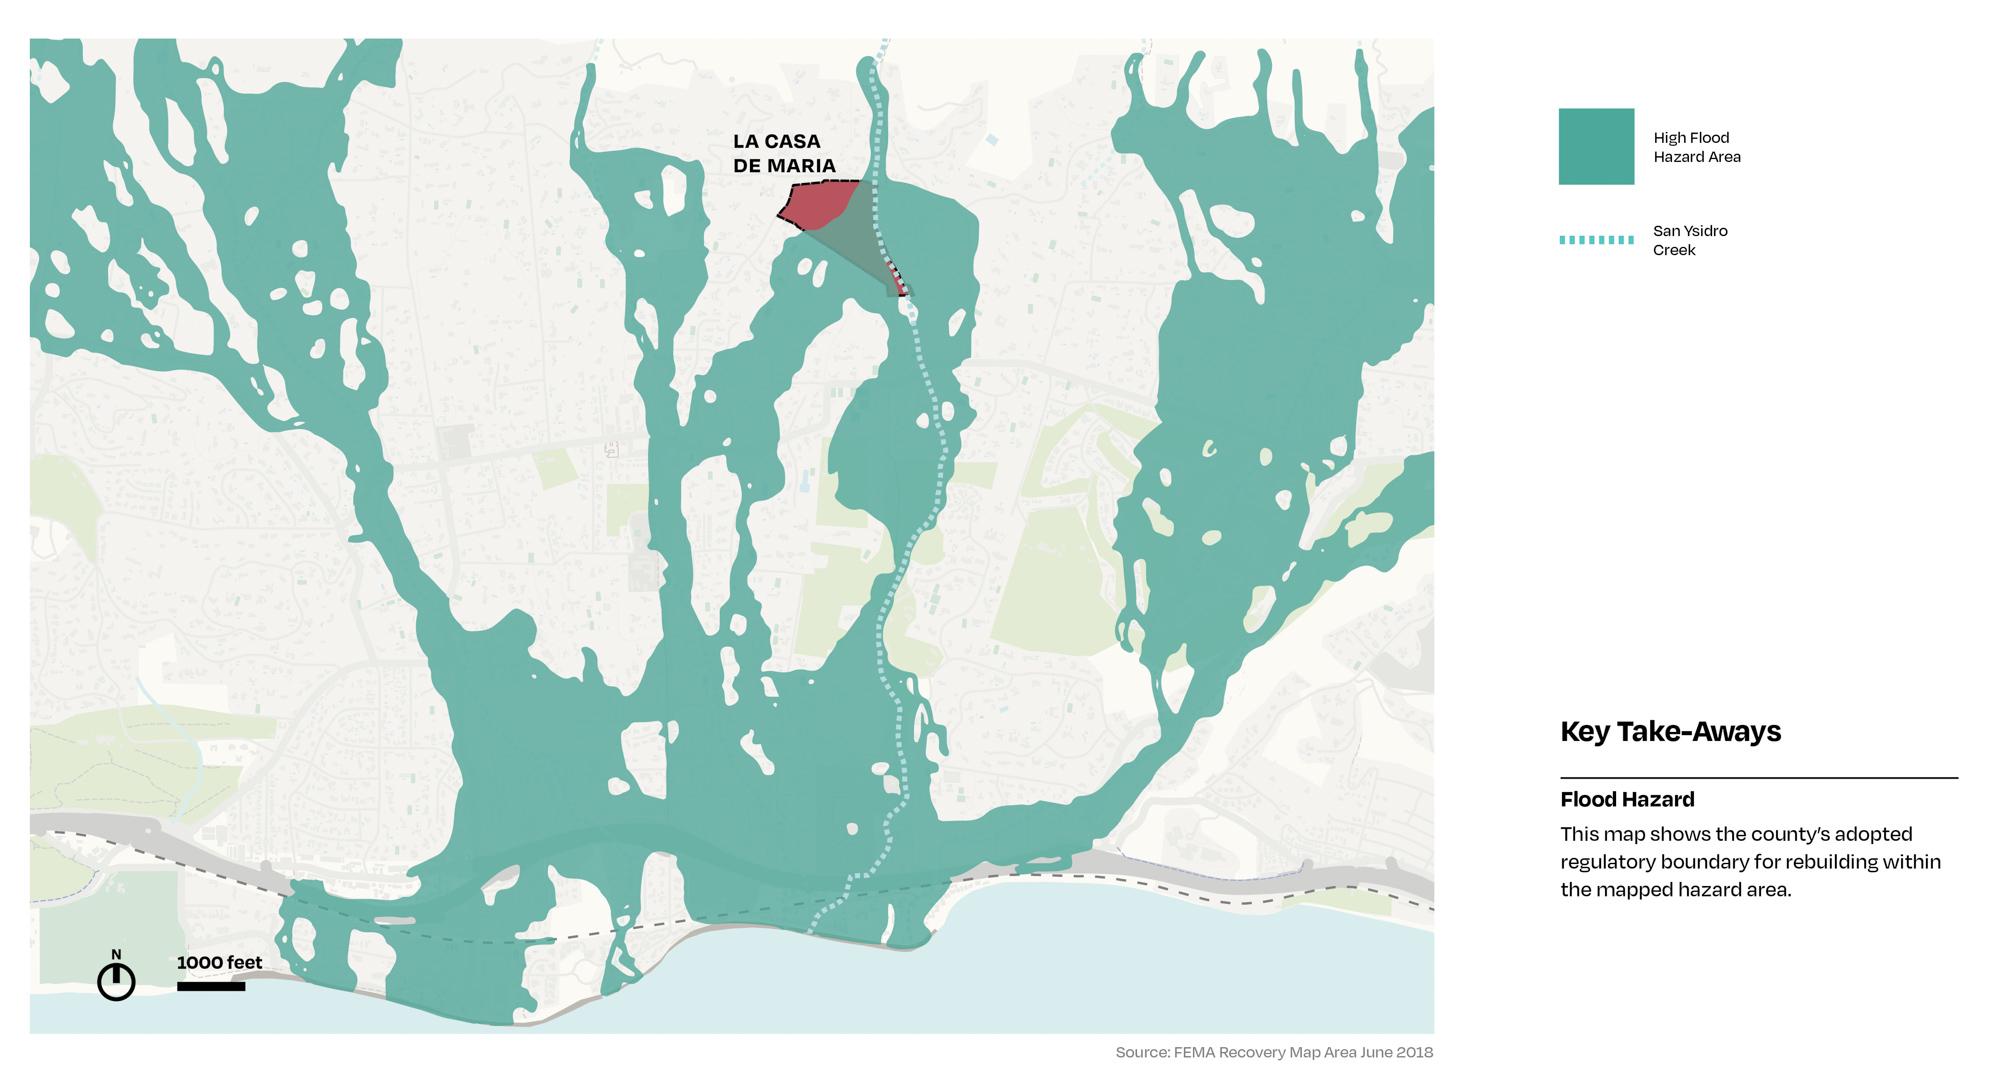 Flood Hazard Diagram